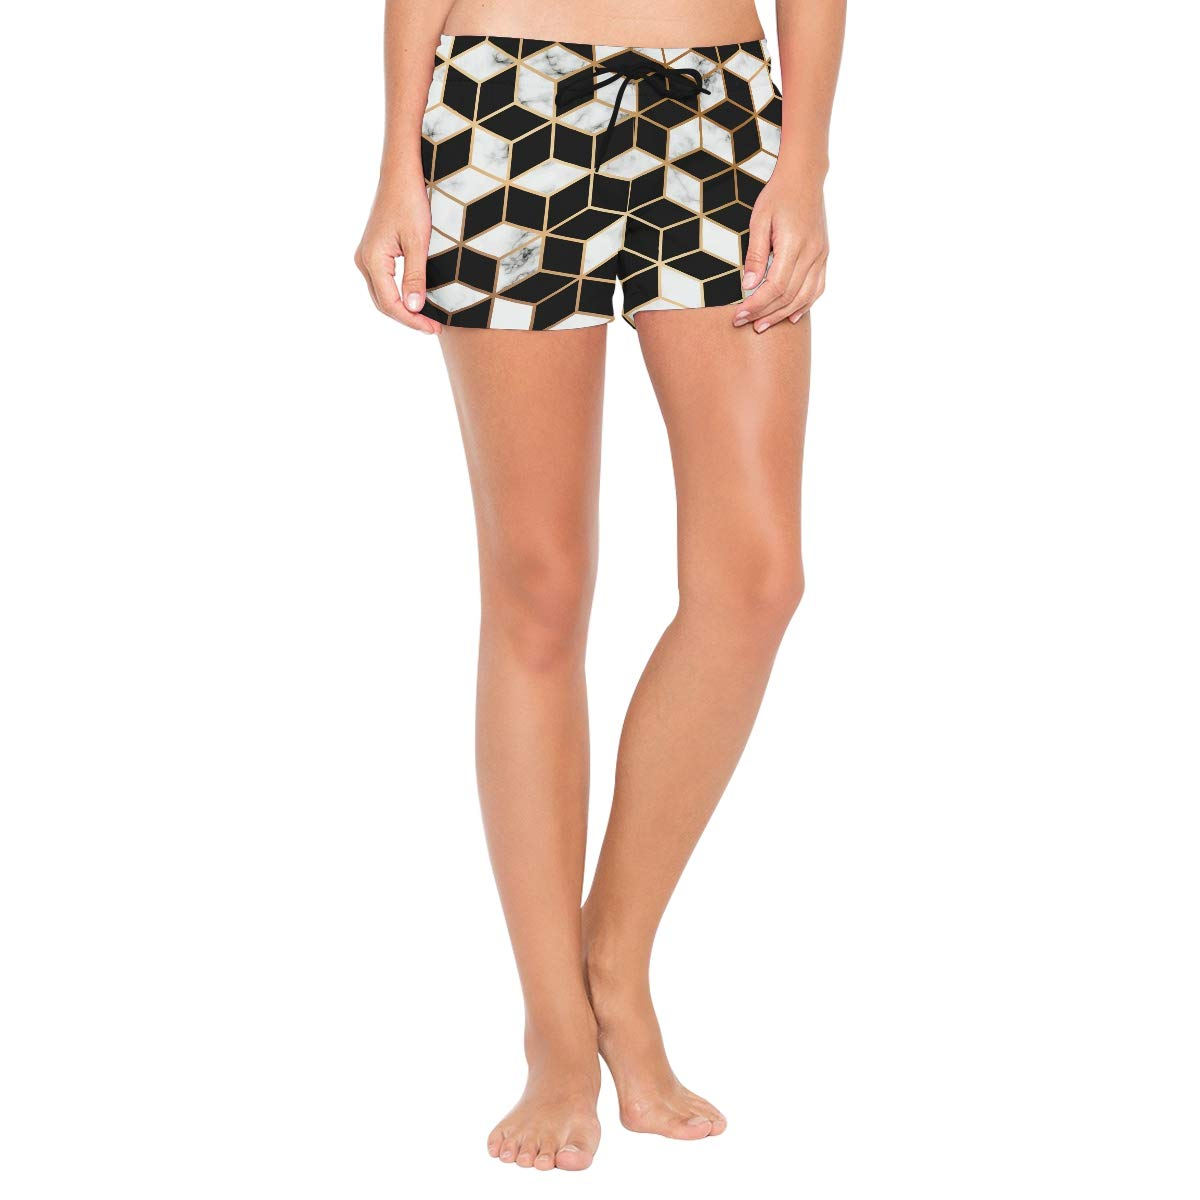 Women Swim Trunks Golden Line Geometric Pattern Black White Beach Board Shorts